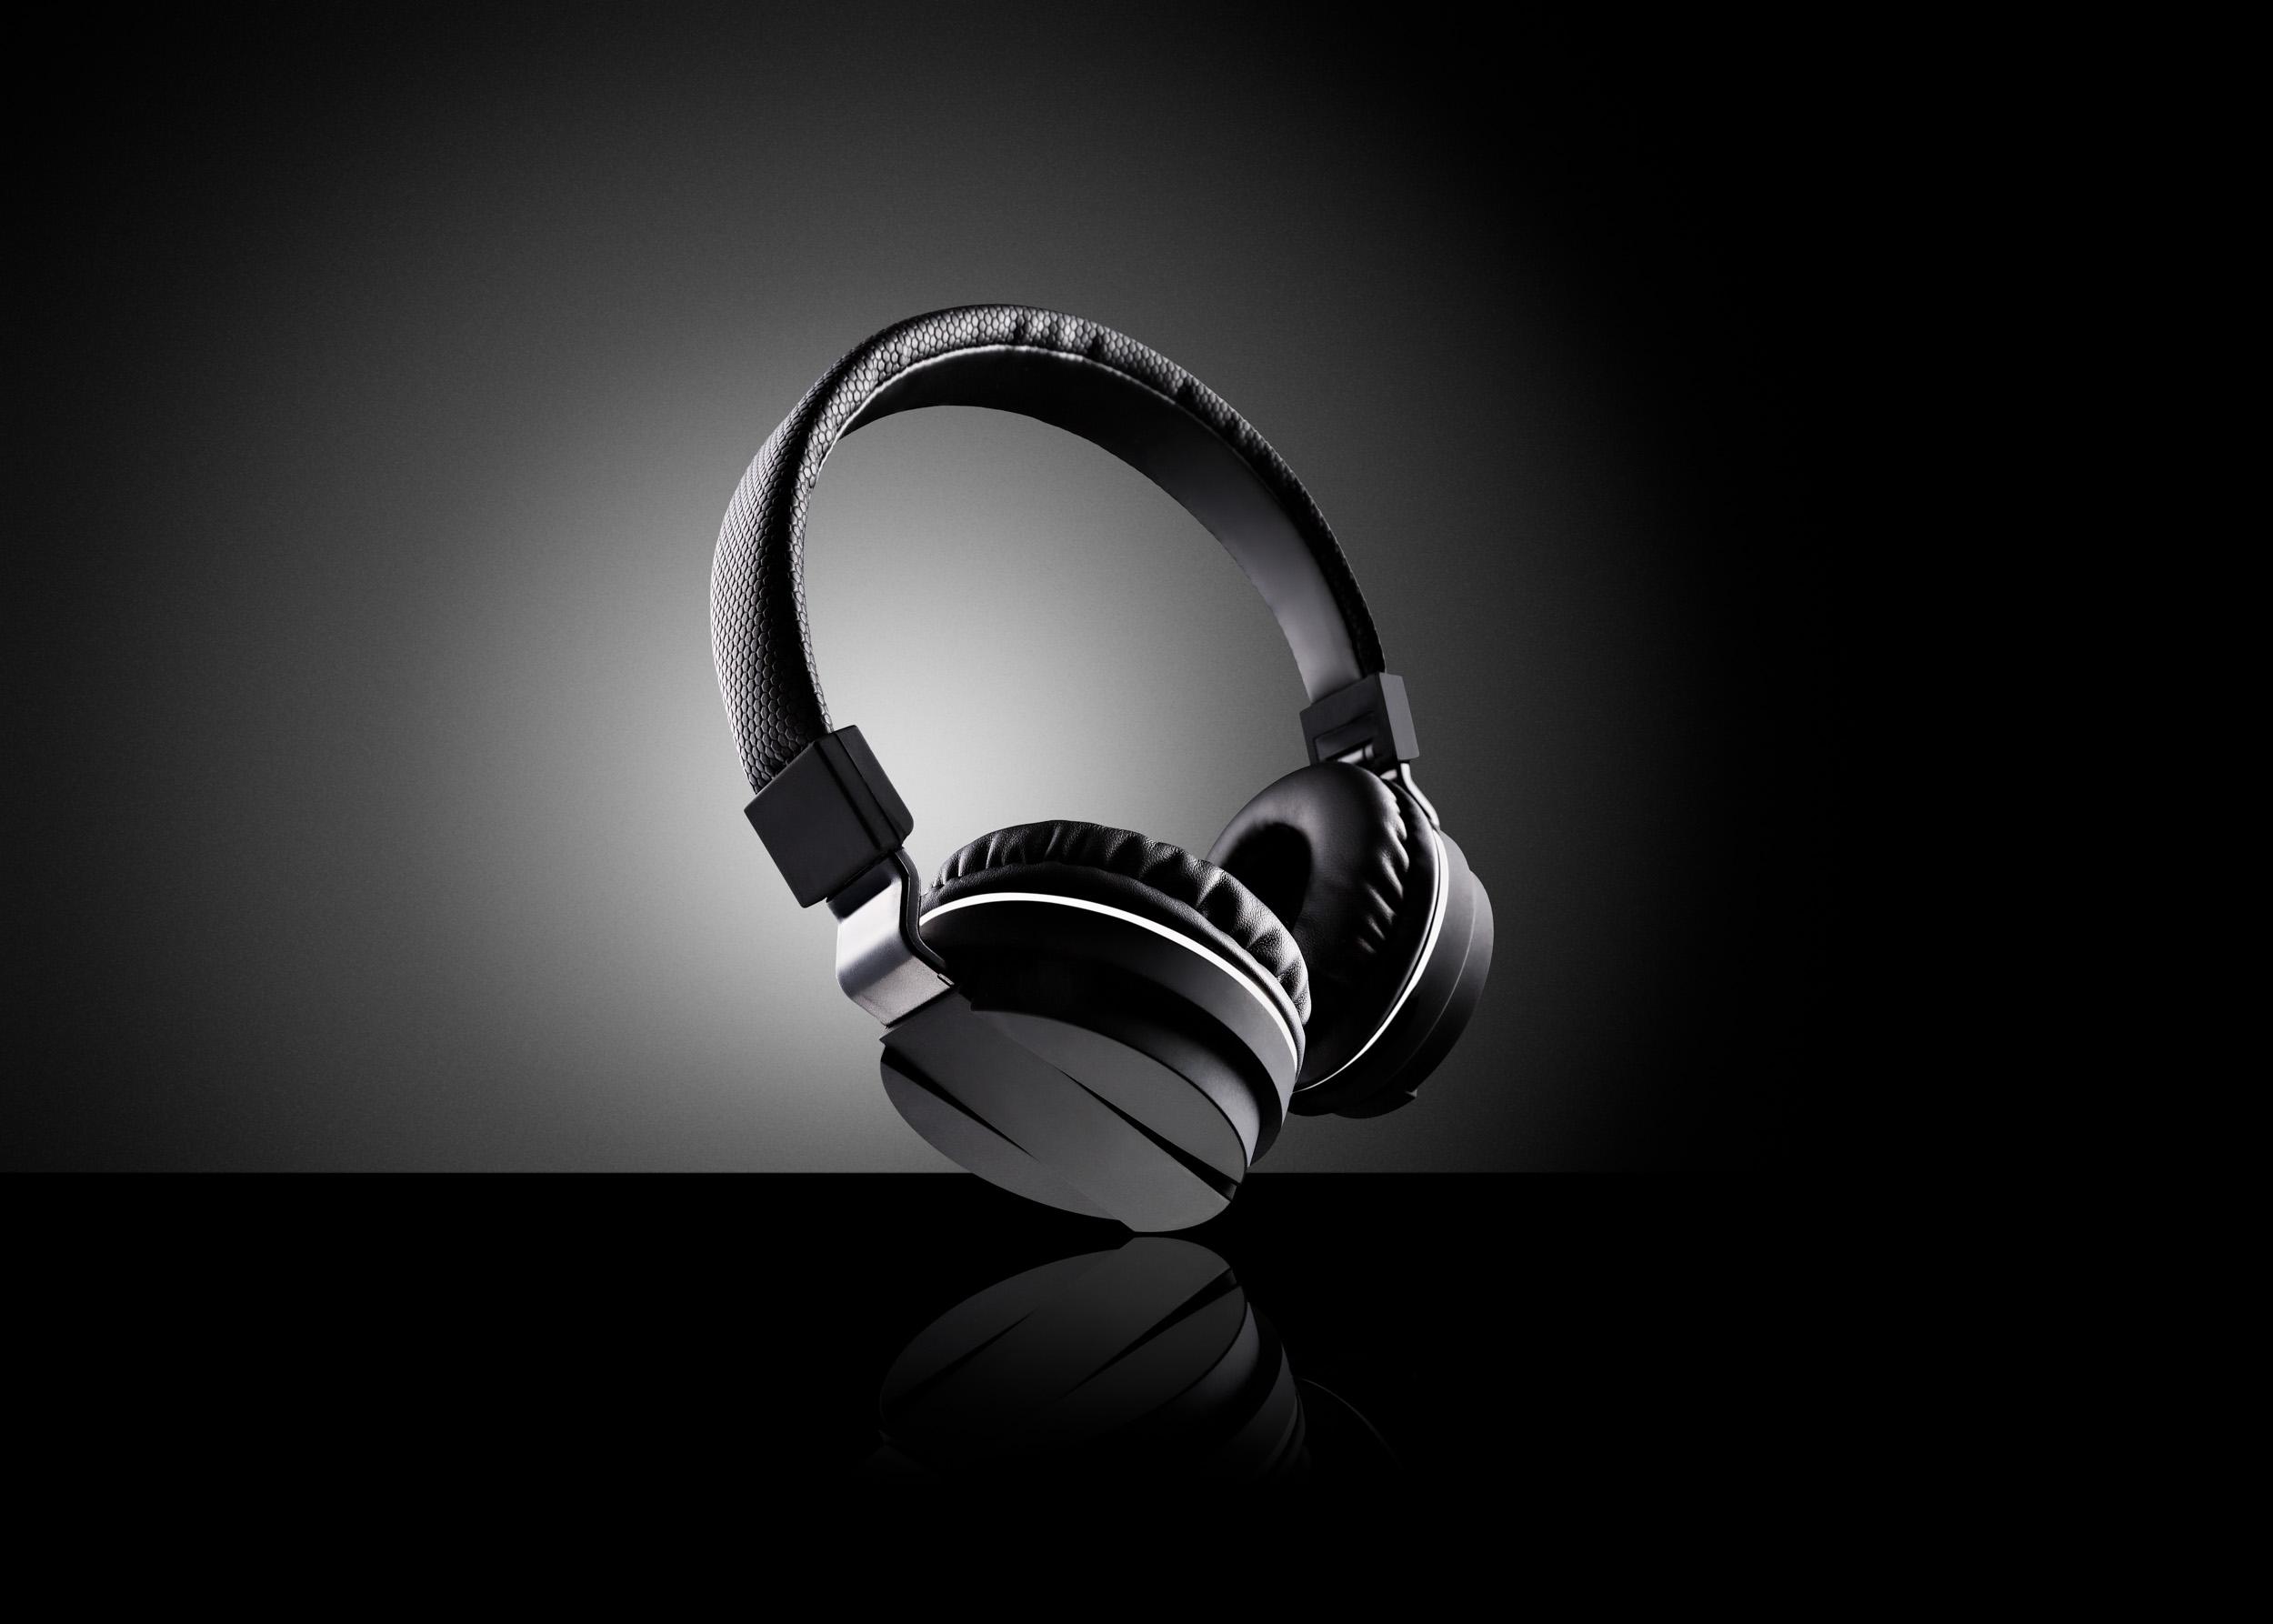 Neal Byrne Photography-Headphones.jpg